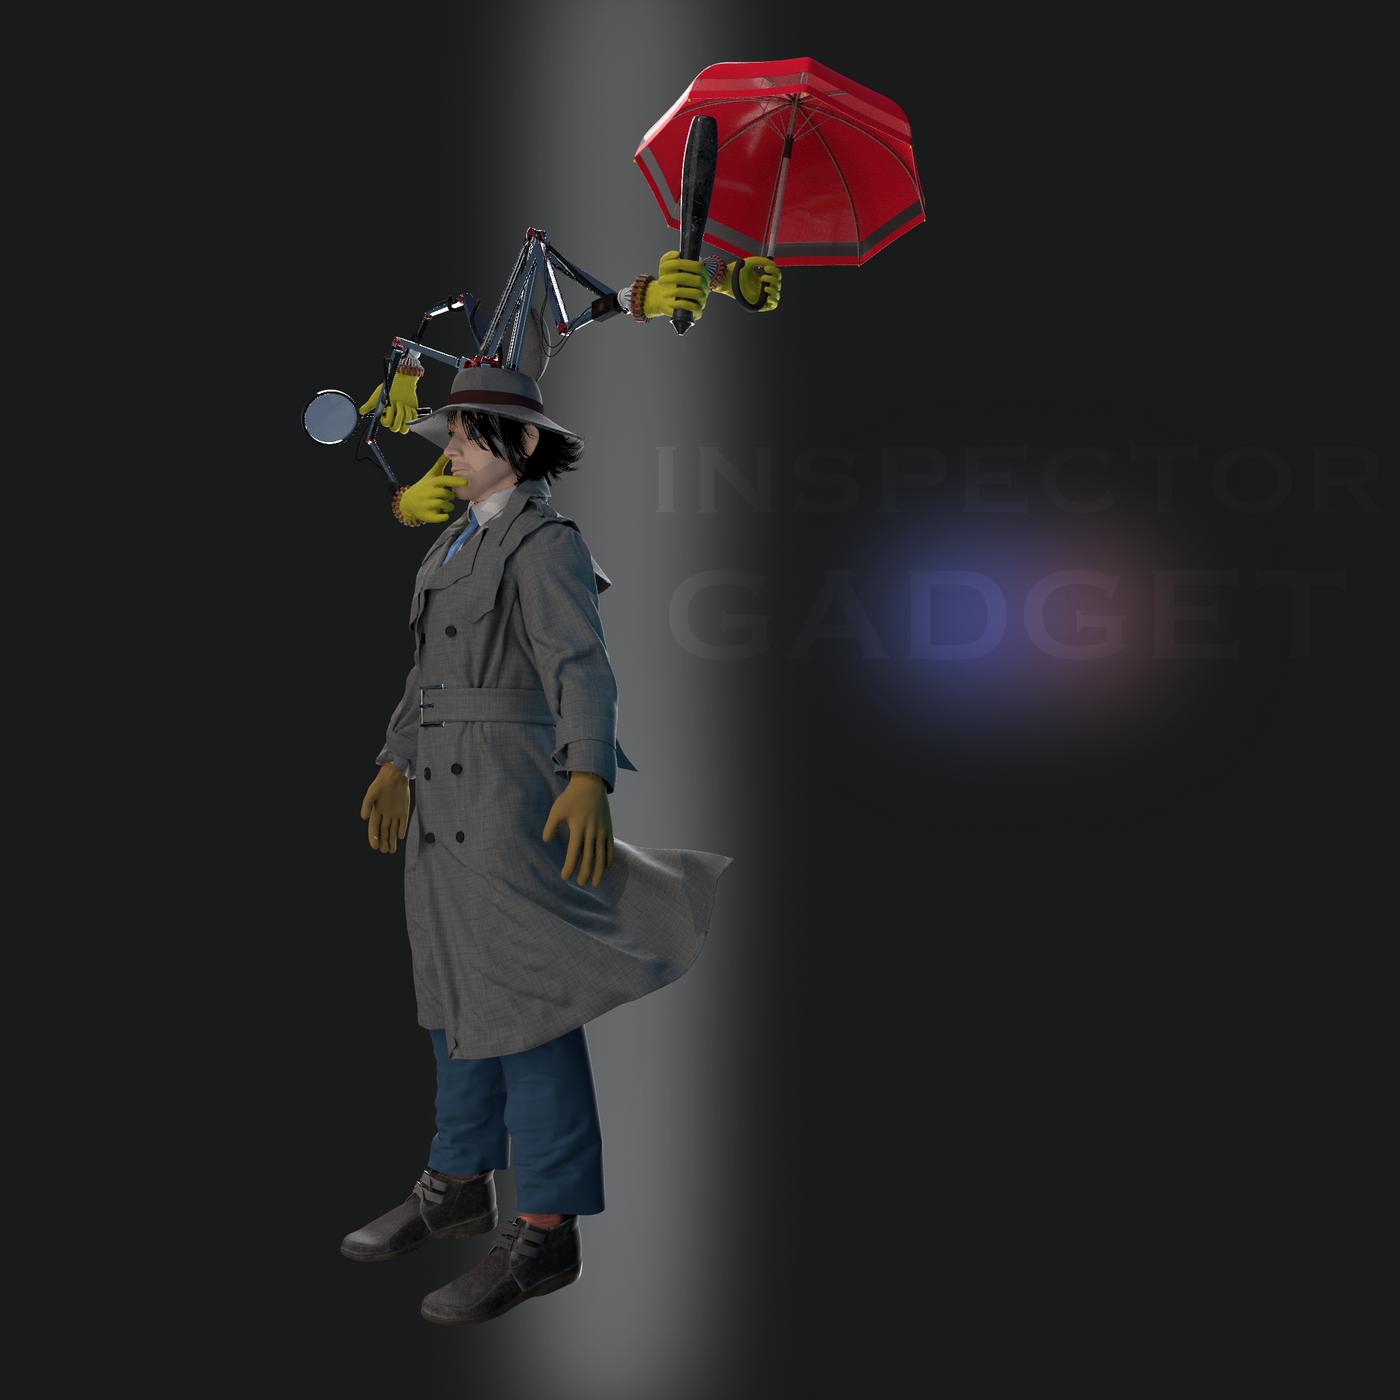 Inspector Gadget Paulgkantinas